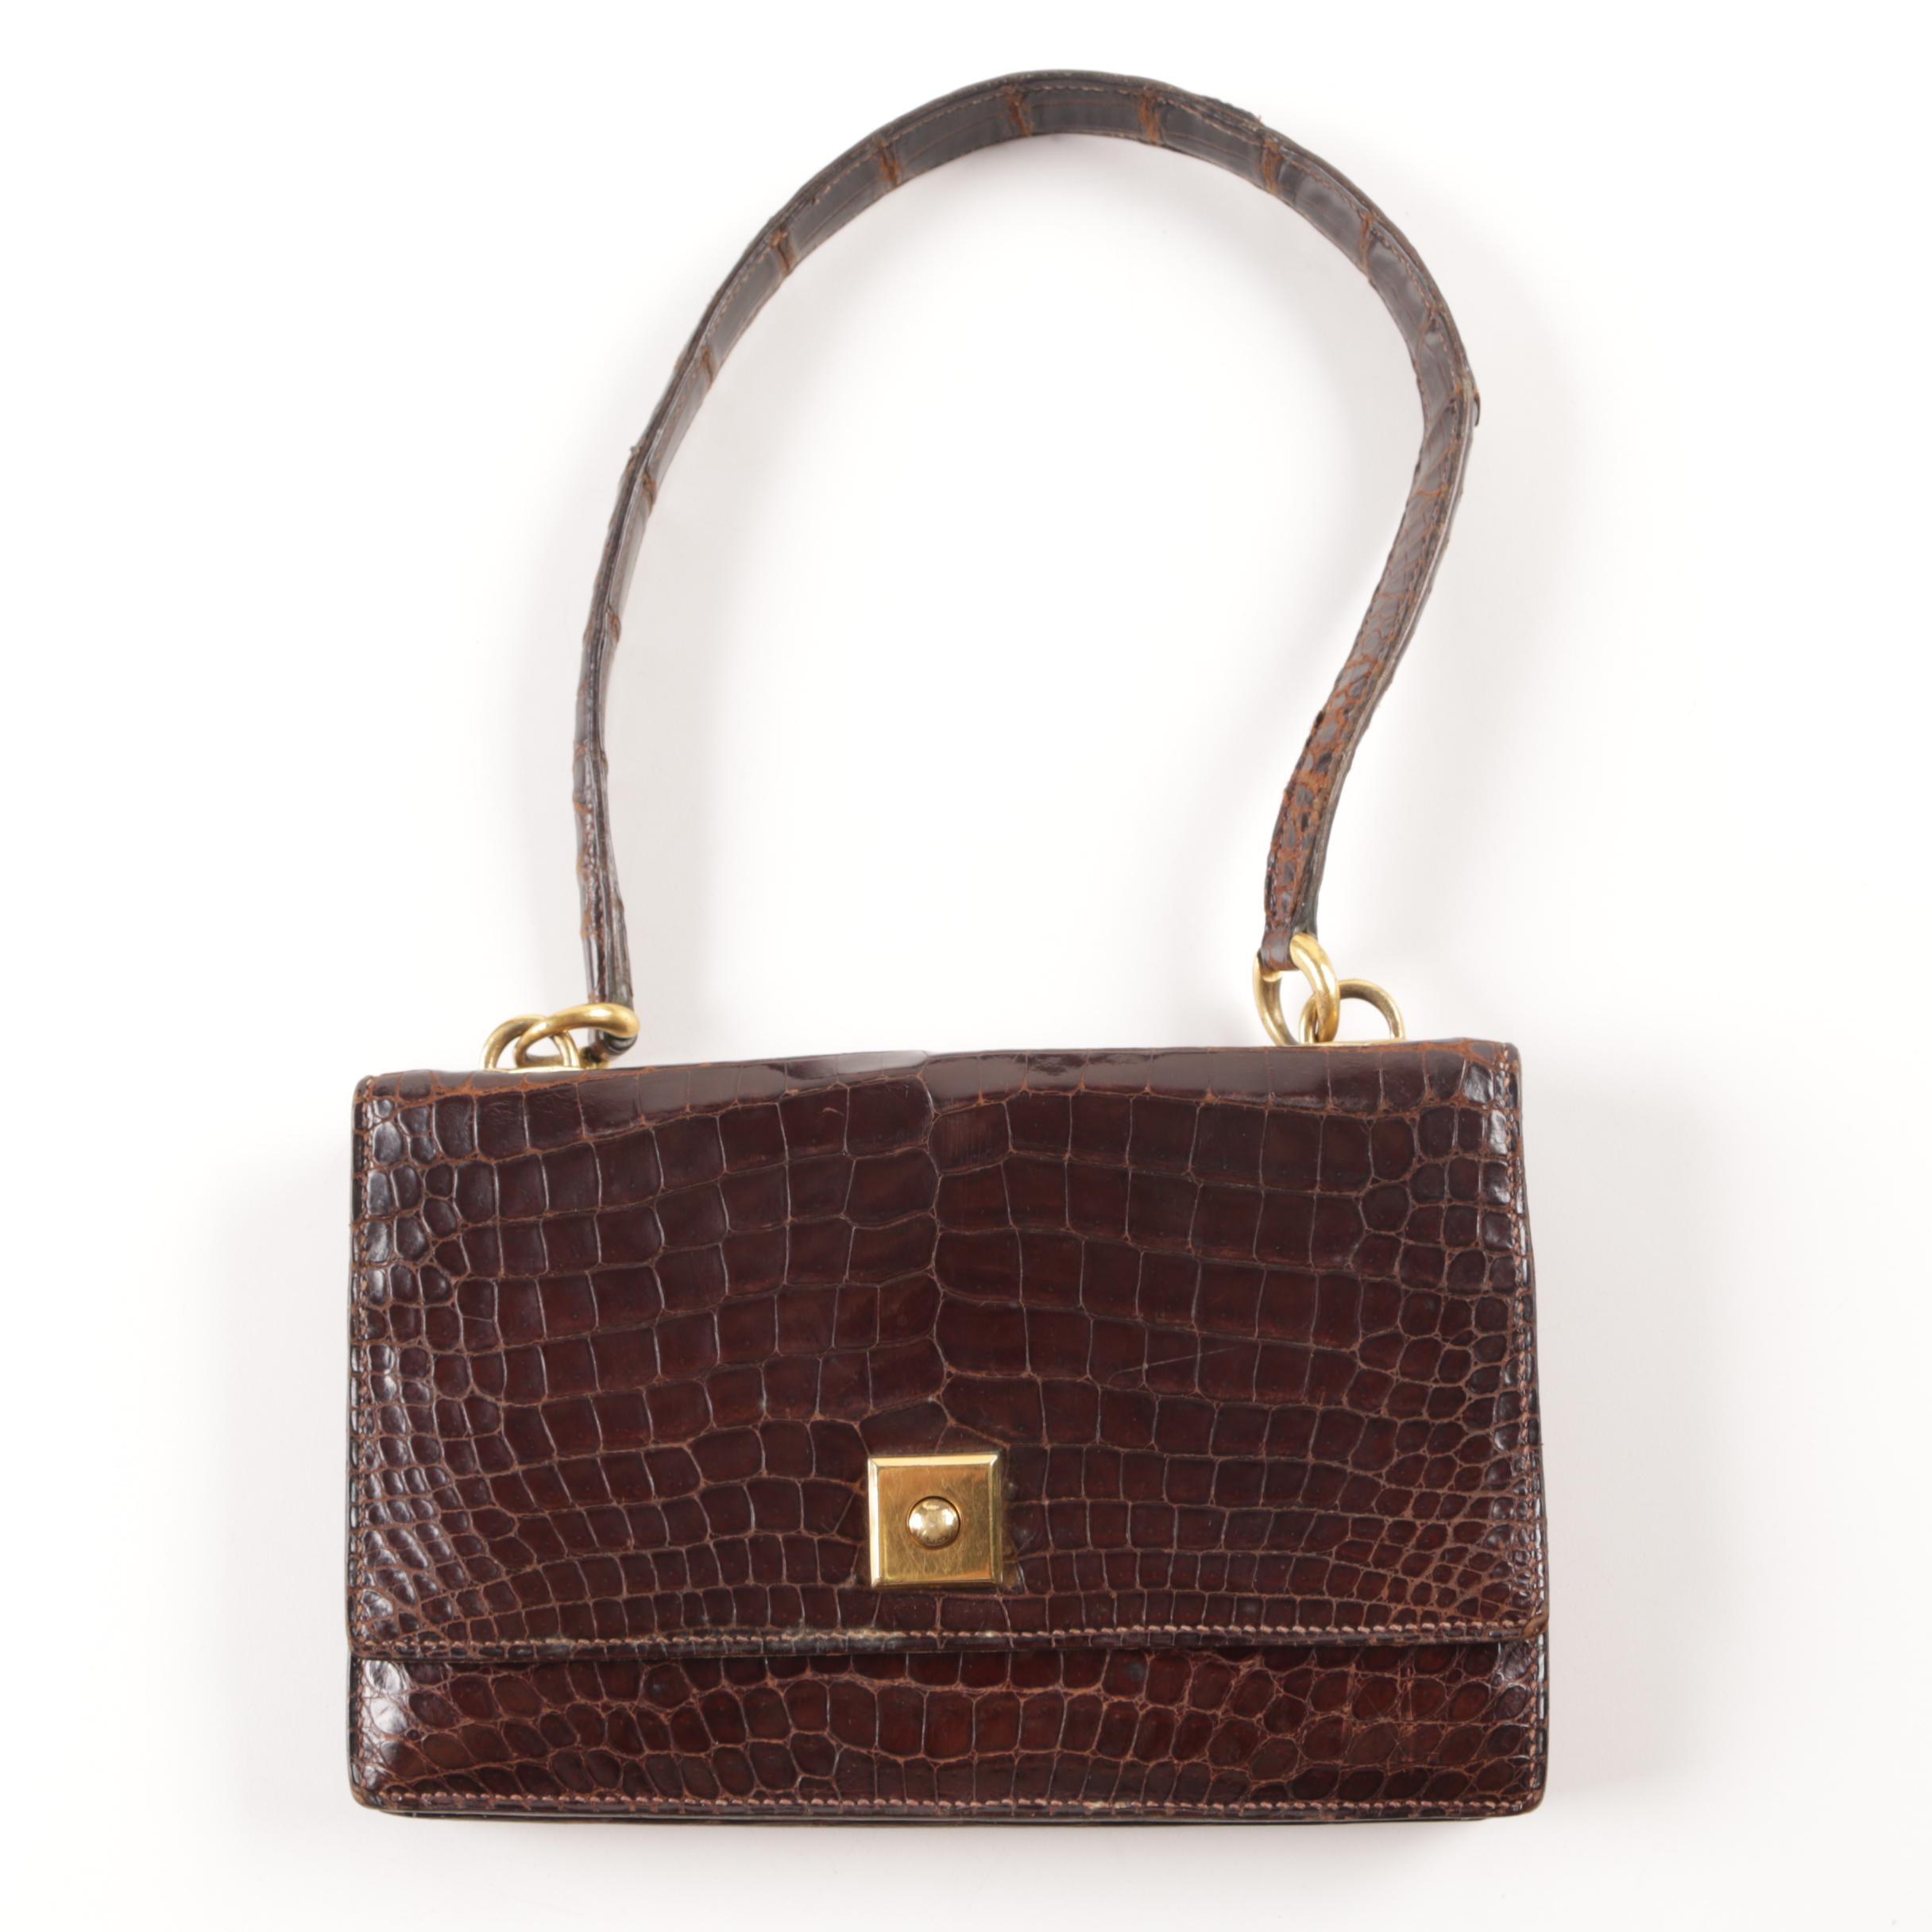 Vintage Hermès Crocodile Handbag